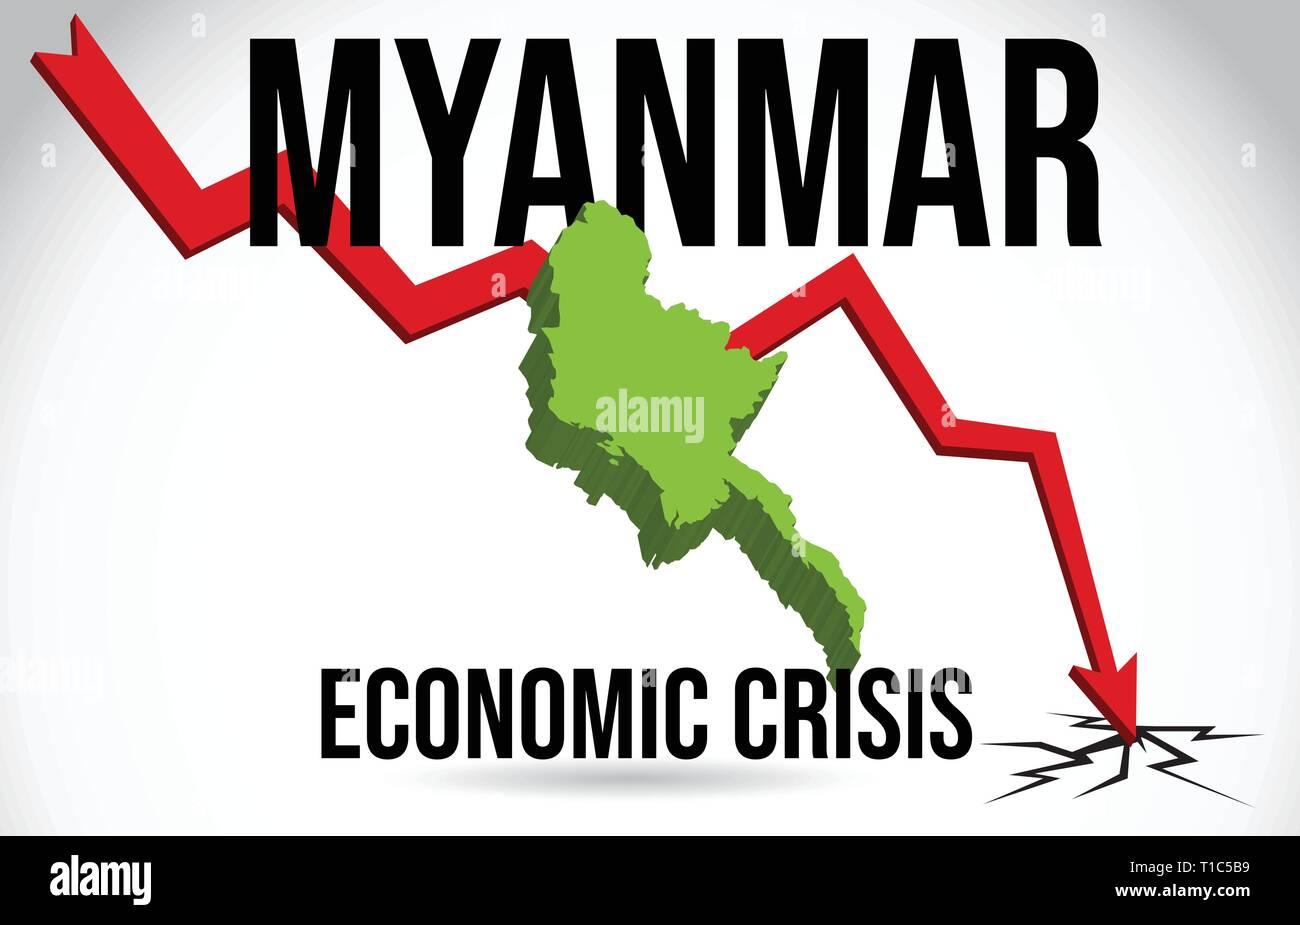 Myanmar Map Financial Crisis Economic Collapse Market Crash Global Meltdown Vector Illustration. - Stock Vector